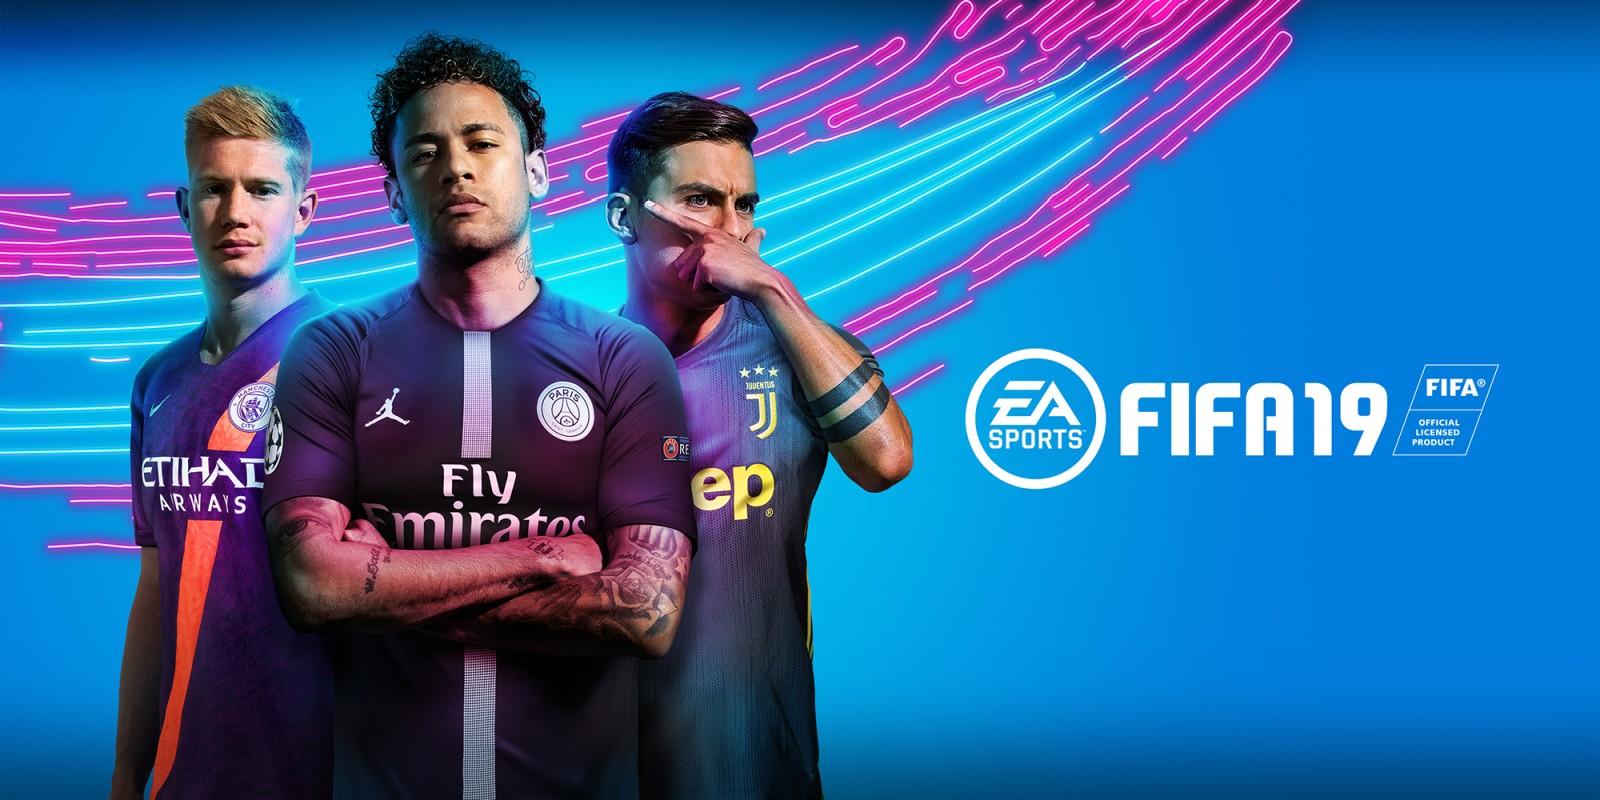 EA | Switch FIFA 19 Nintendo | | Games Nintendo SPORTS™